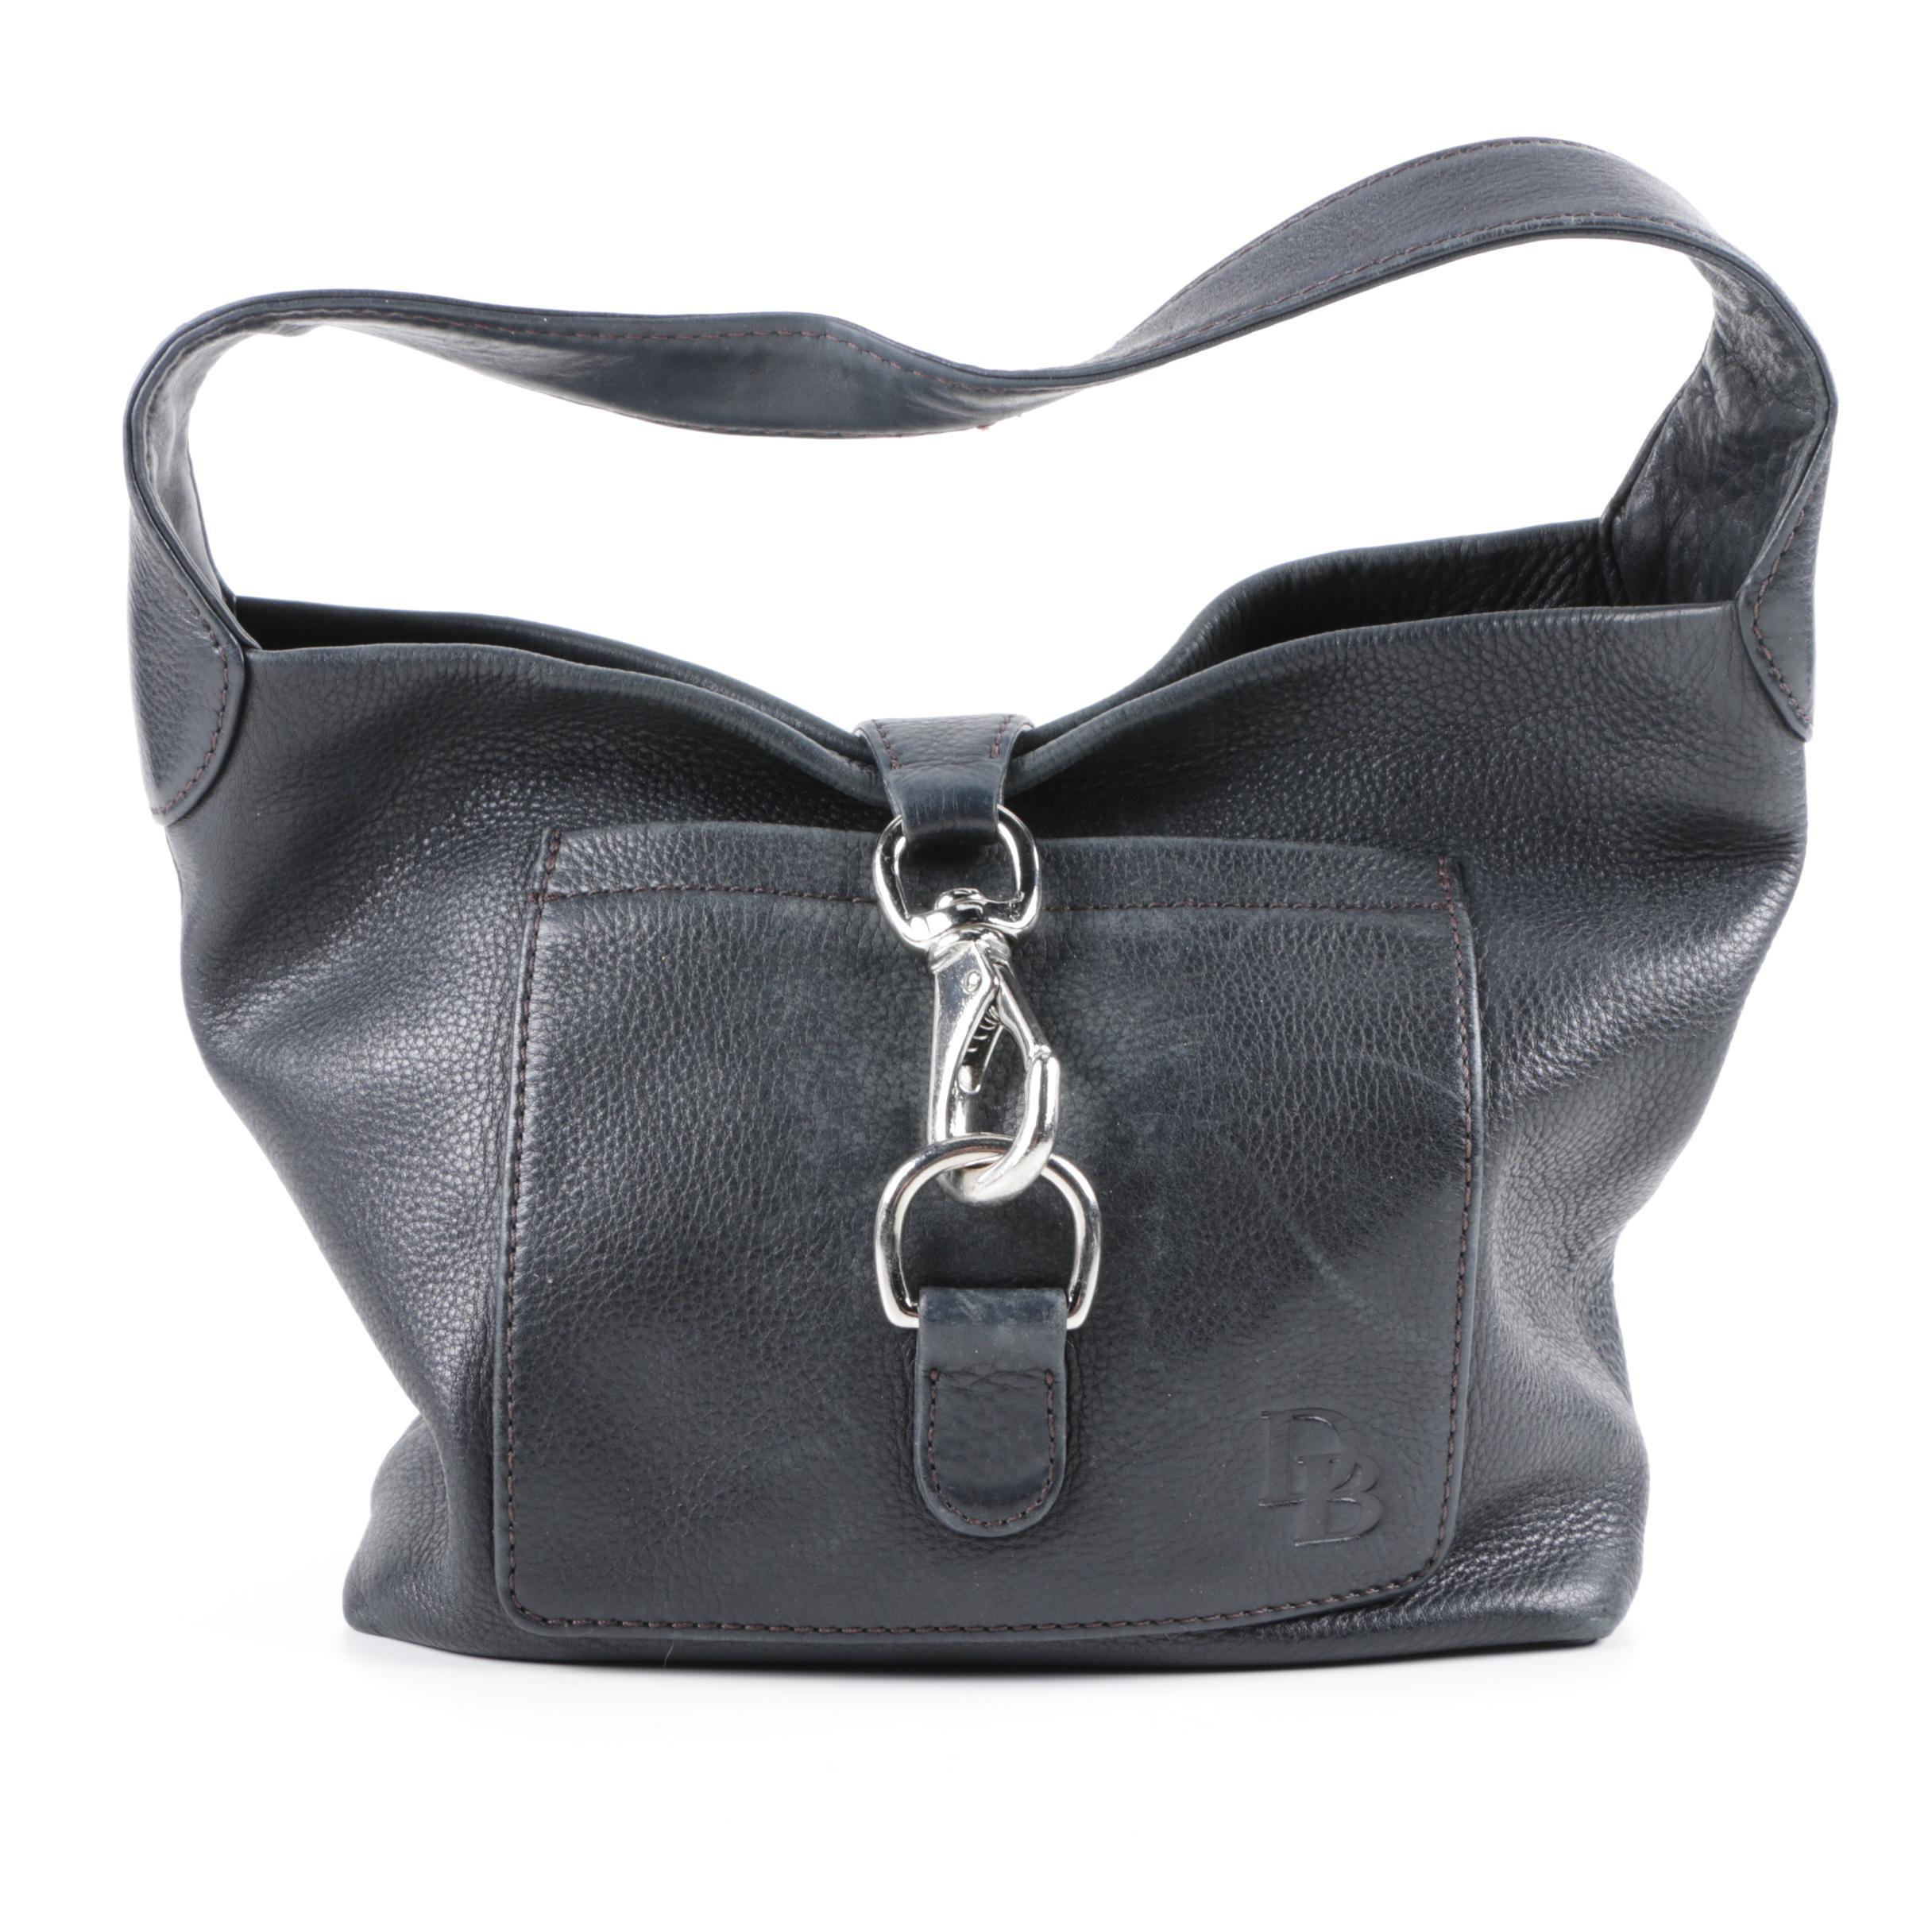 Dooney & Bourke Black Pebbled Leather Hobo Bag